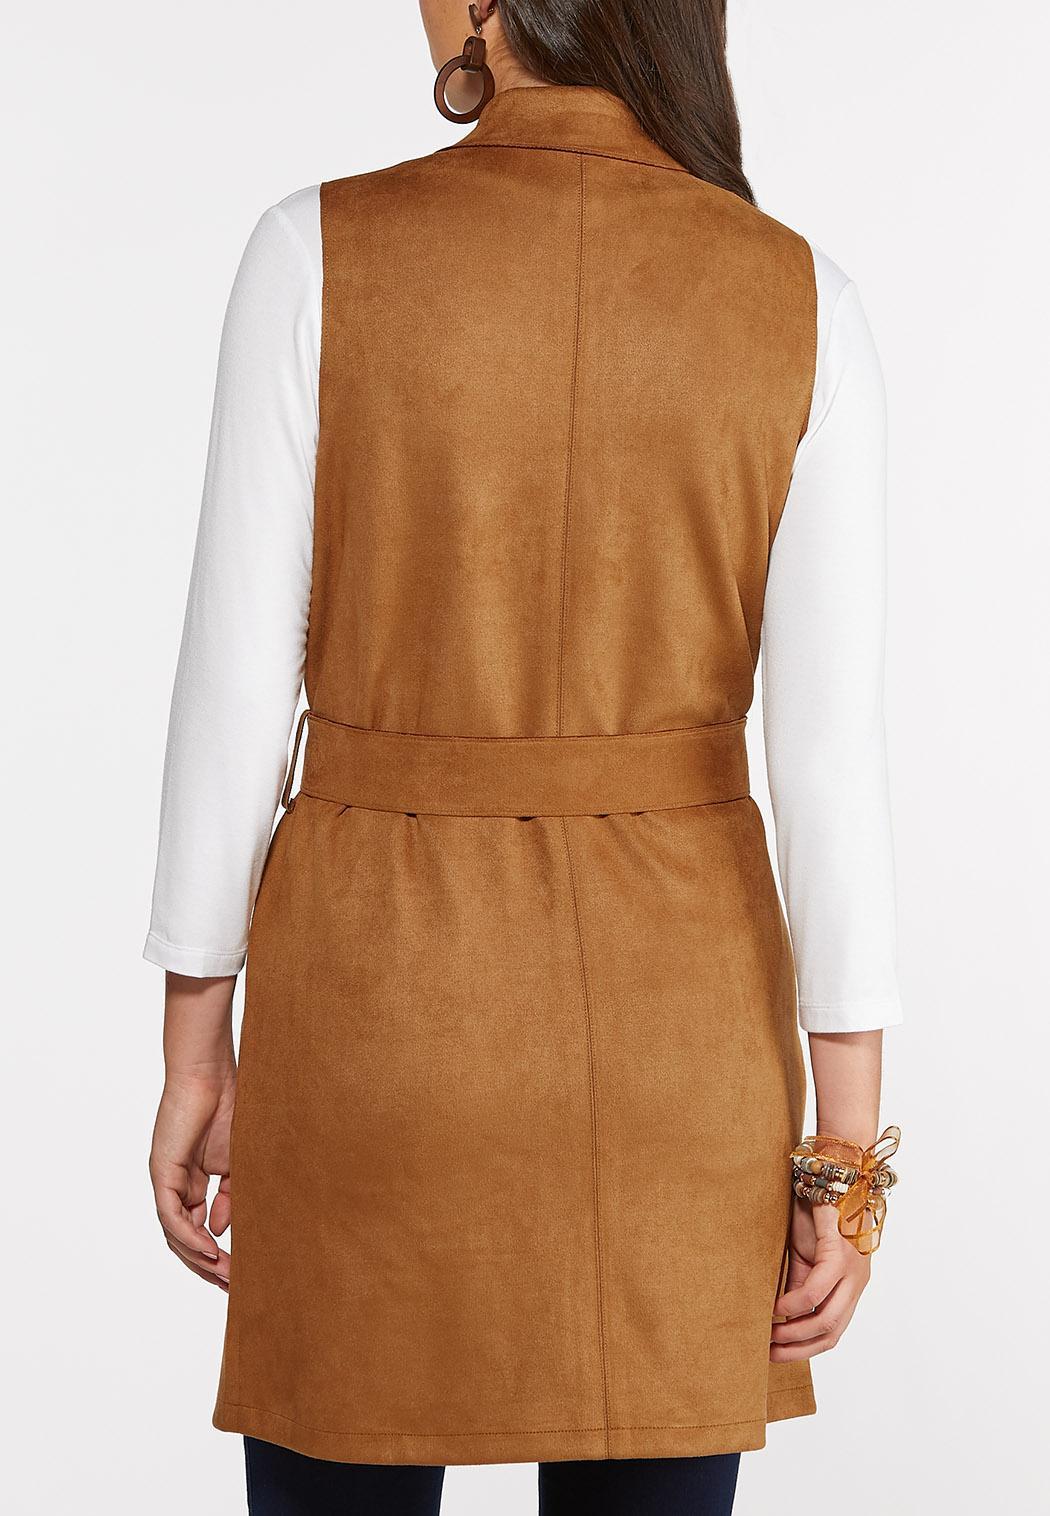 Belted Faux Suede Vest (Item #44351075)